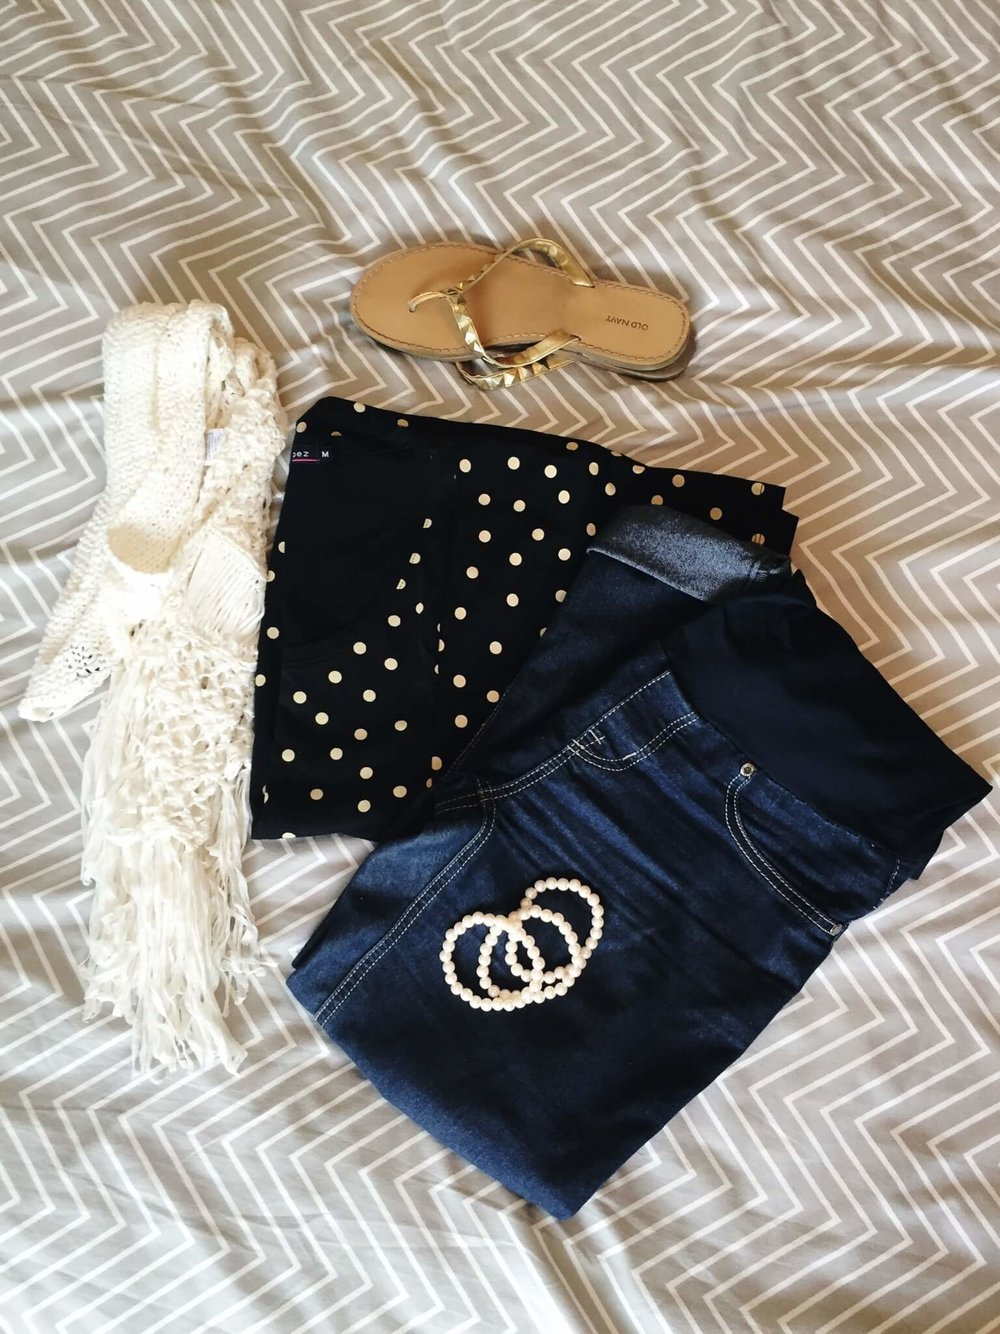 Tee + Jeans + Crochet Vest + Sandals